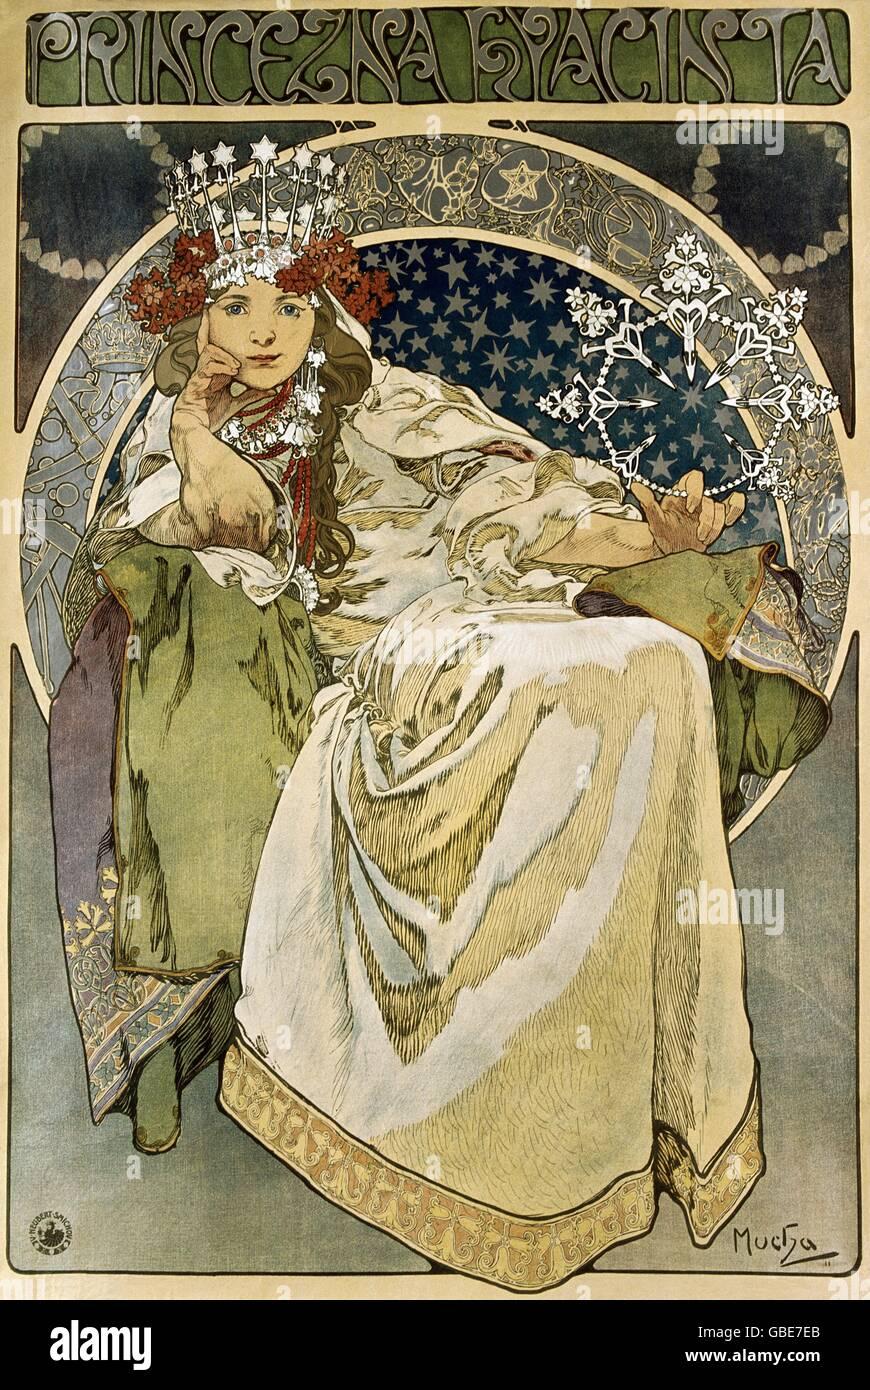 "Beaux-arts, Mucha, Alfons (1860 - 1939), affiche, Hyacinia «Princezna"" (princesse), Jacinthe, lithographie, 1911 Banque D'Images"